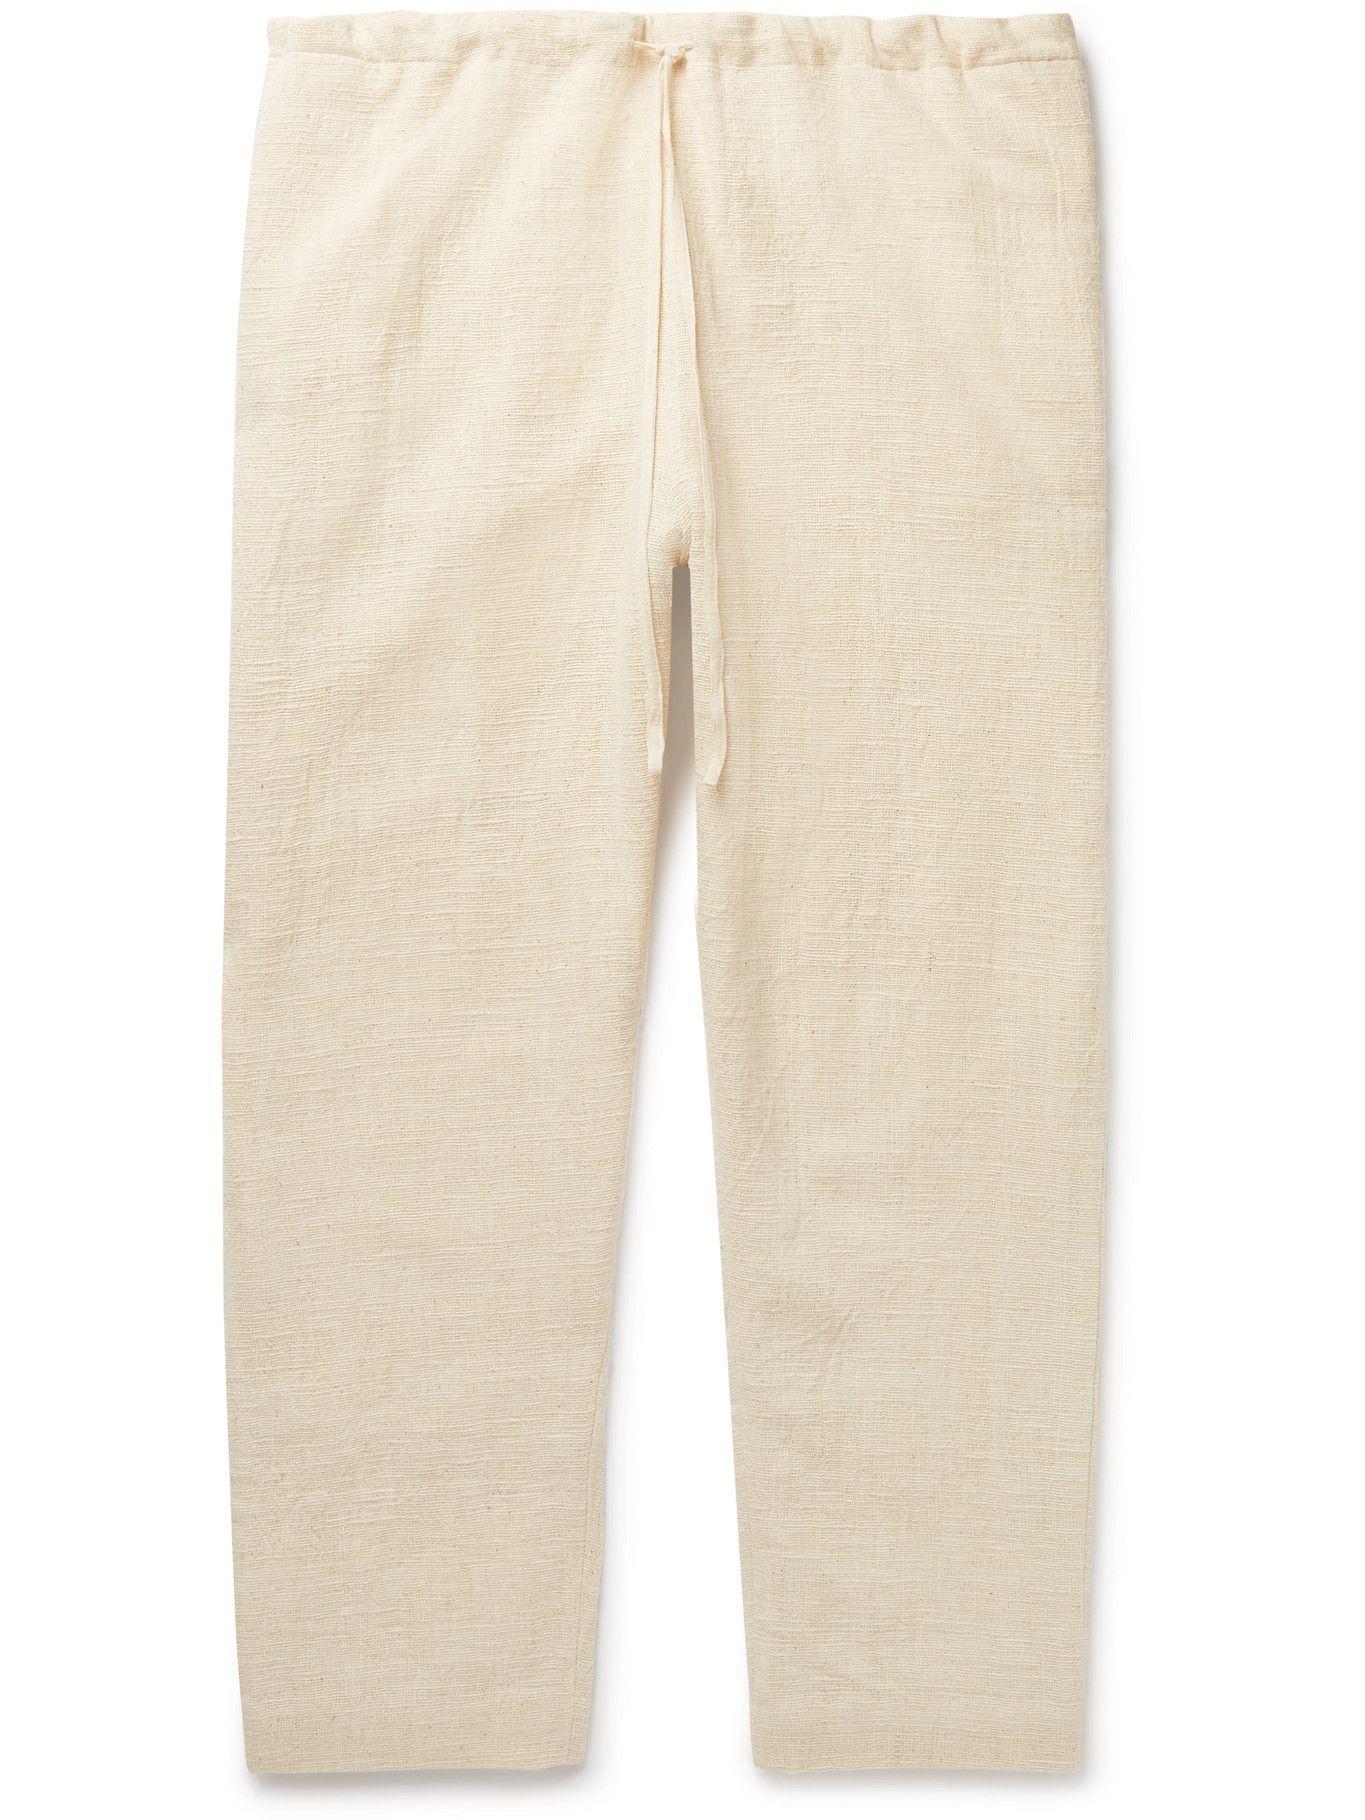 11.11/eleven eleven - Cotton-Canvas Drawstring Trousers - Neutrals